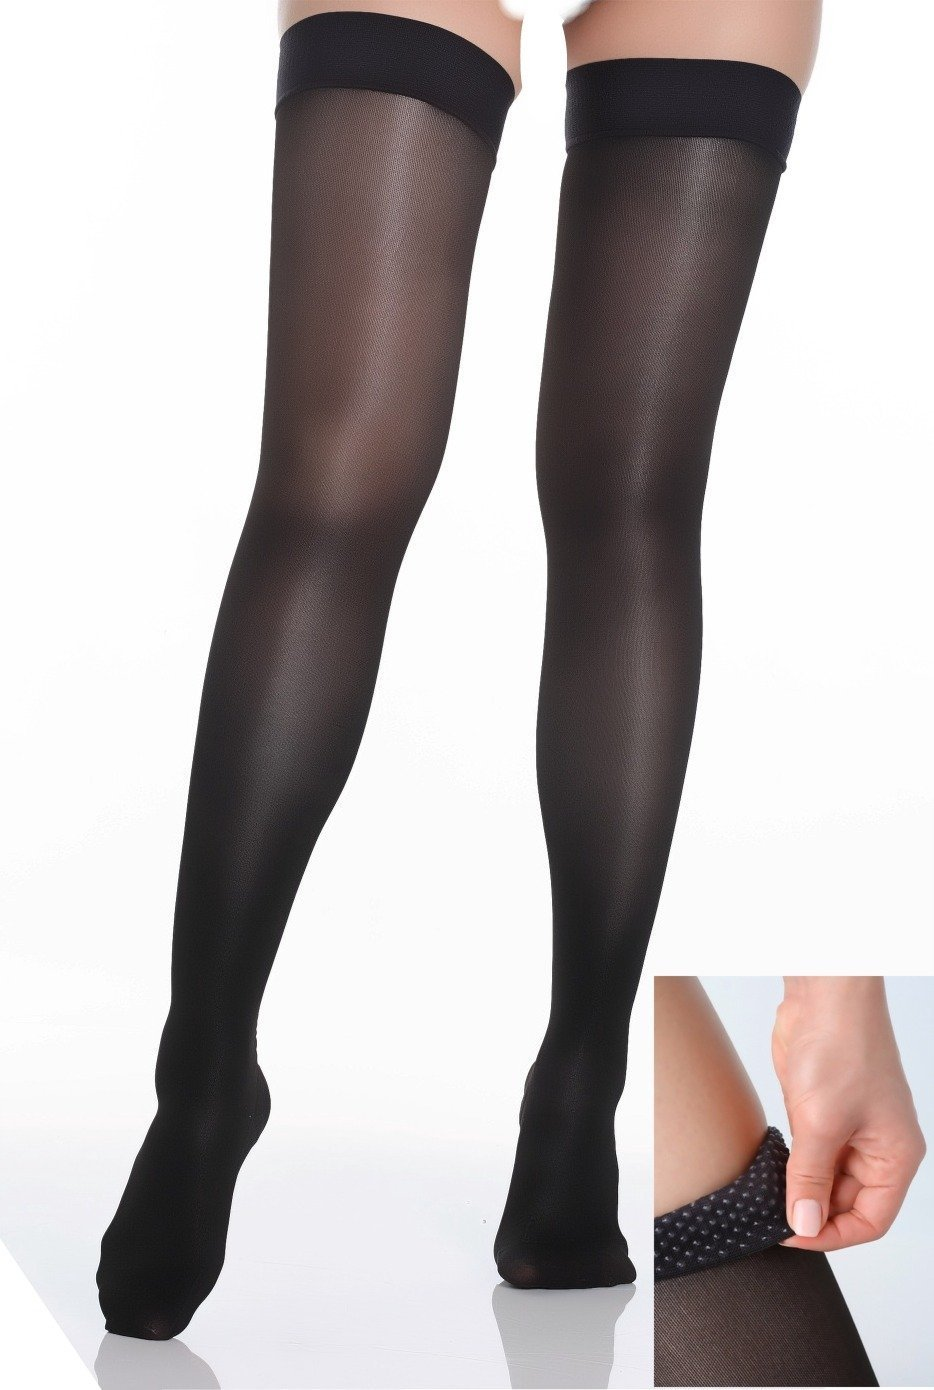 amazon com briteleafs opaque thigh high compression stockings